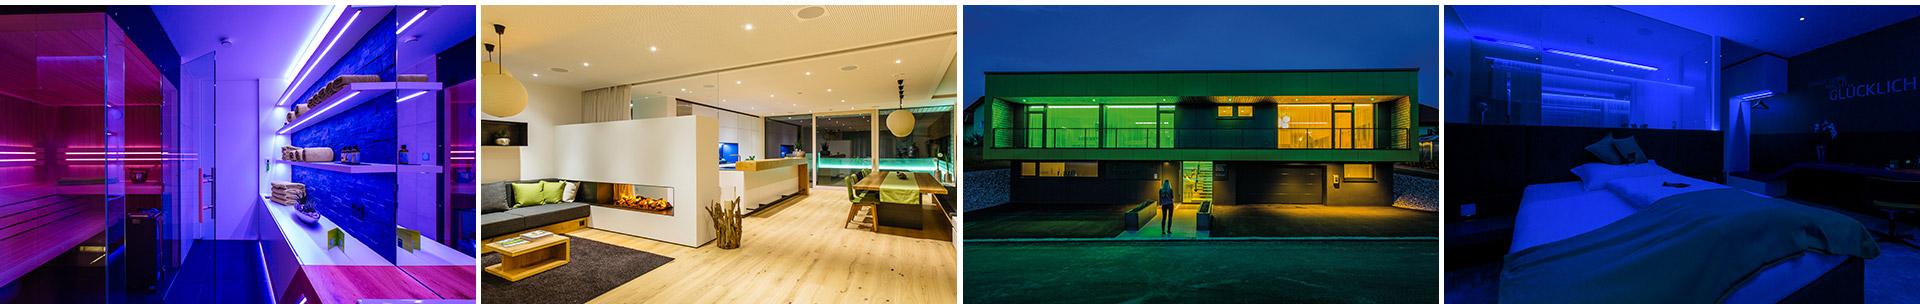 smart lighting intelligent lighting control lighting moods for